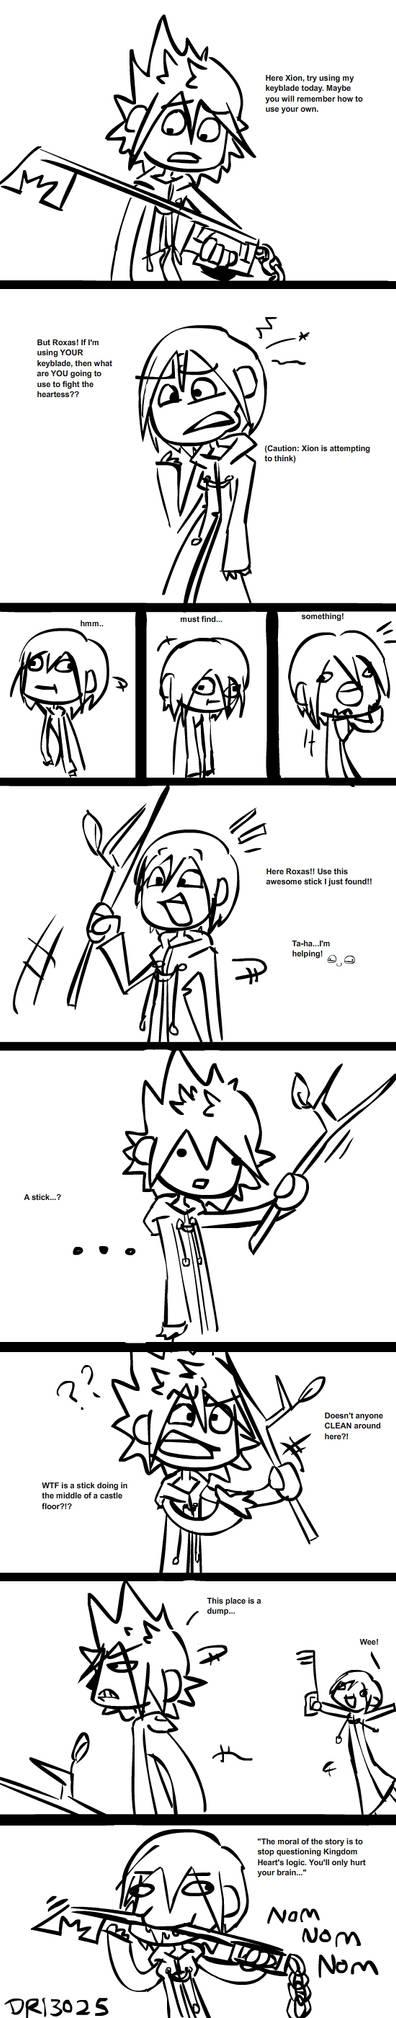 Kingdom Hearts Logic is COOL